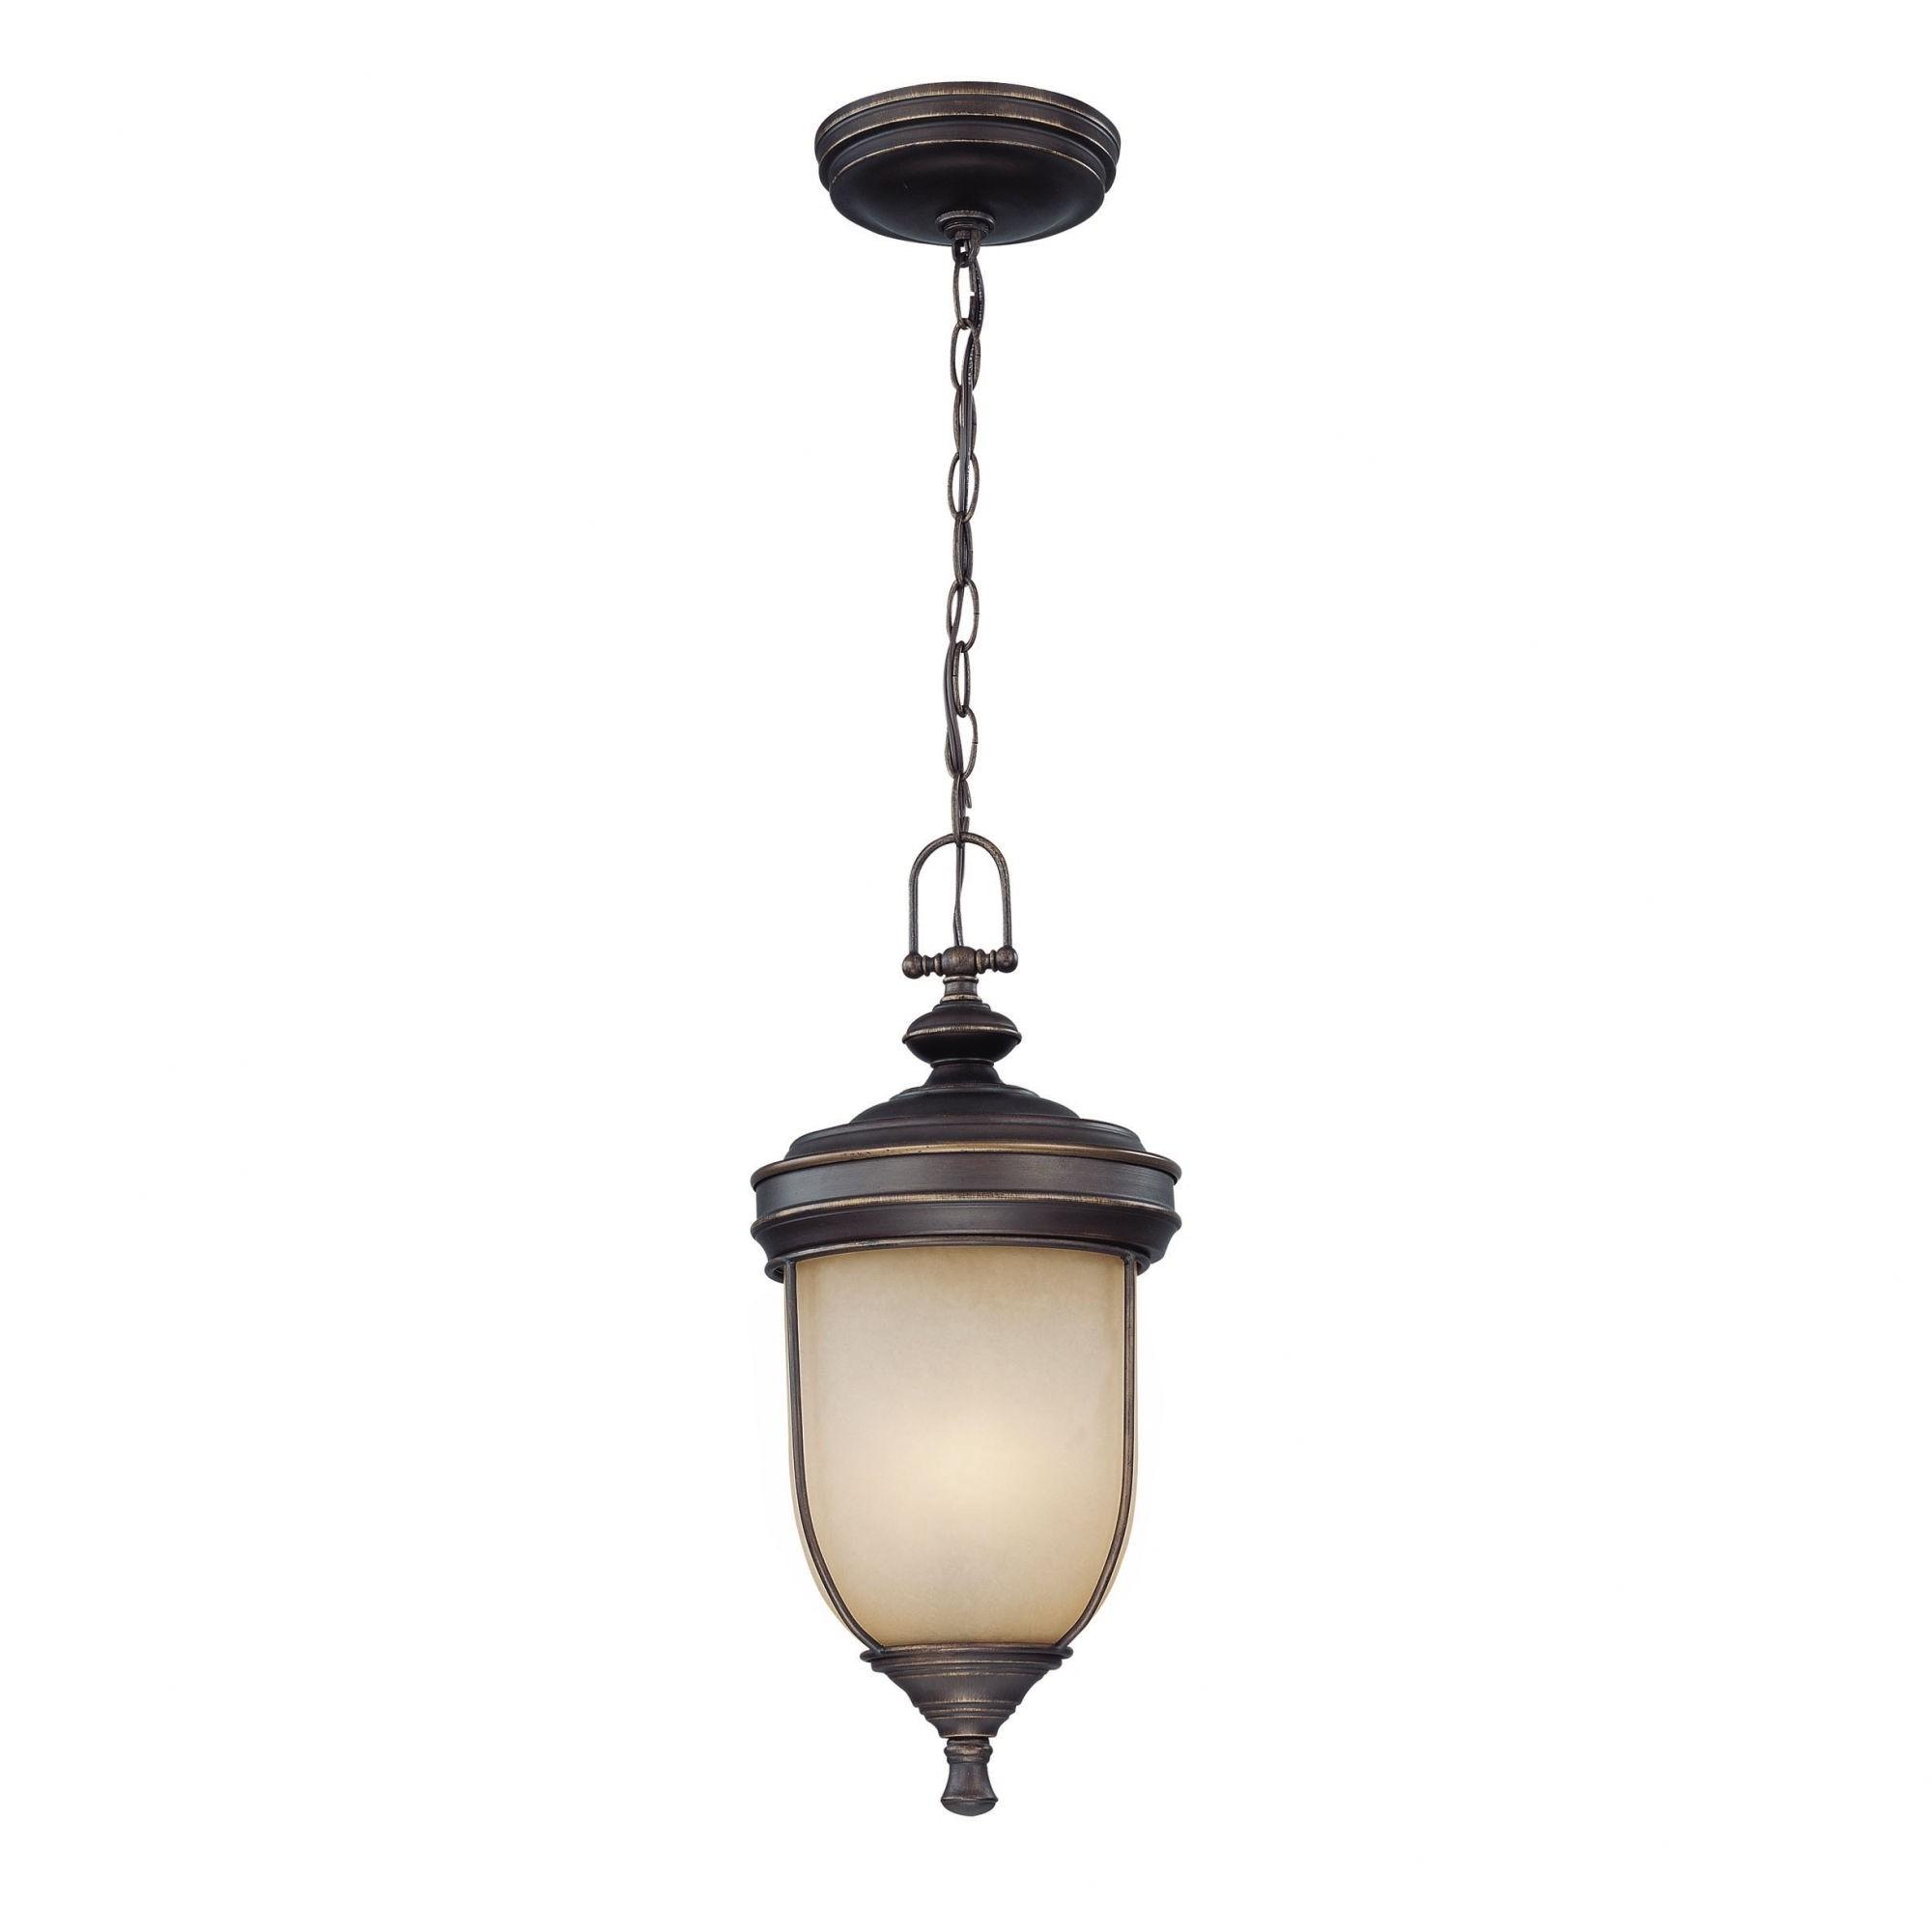 Popular Photo of Antique Outdoor Hanging Lights